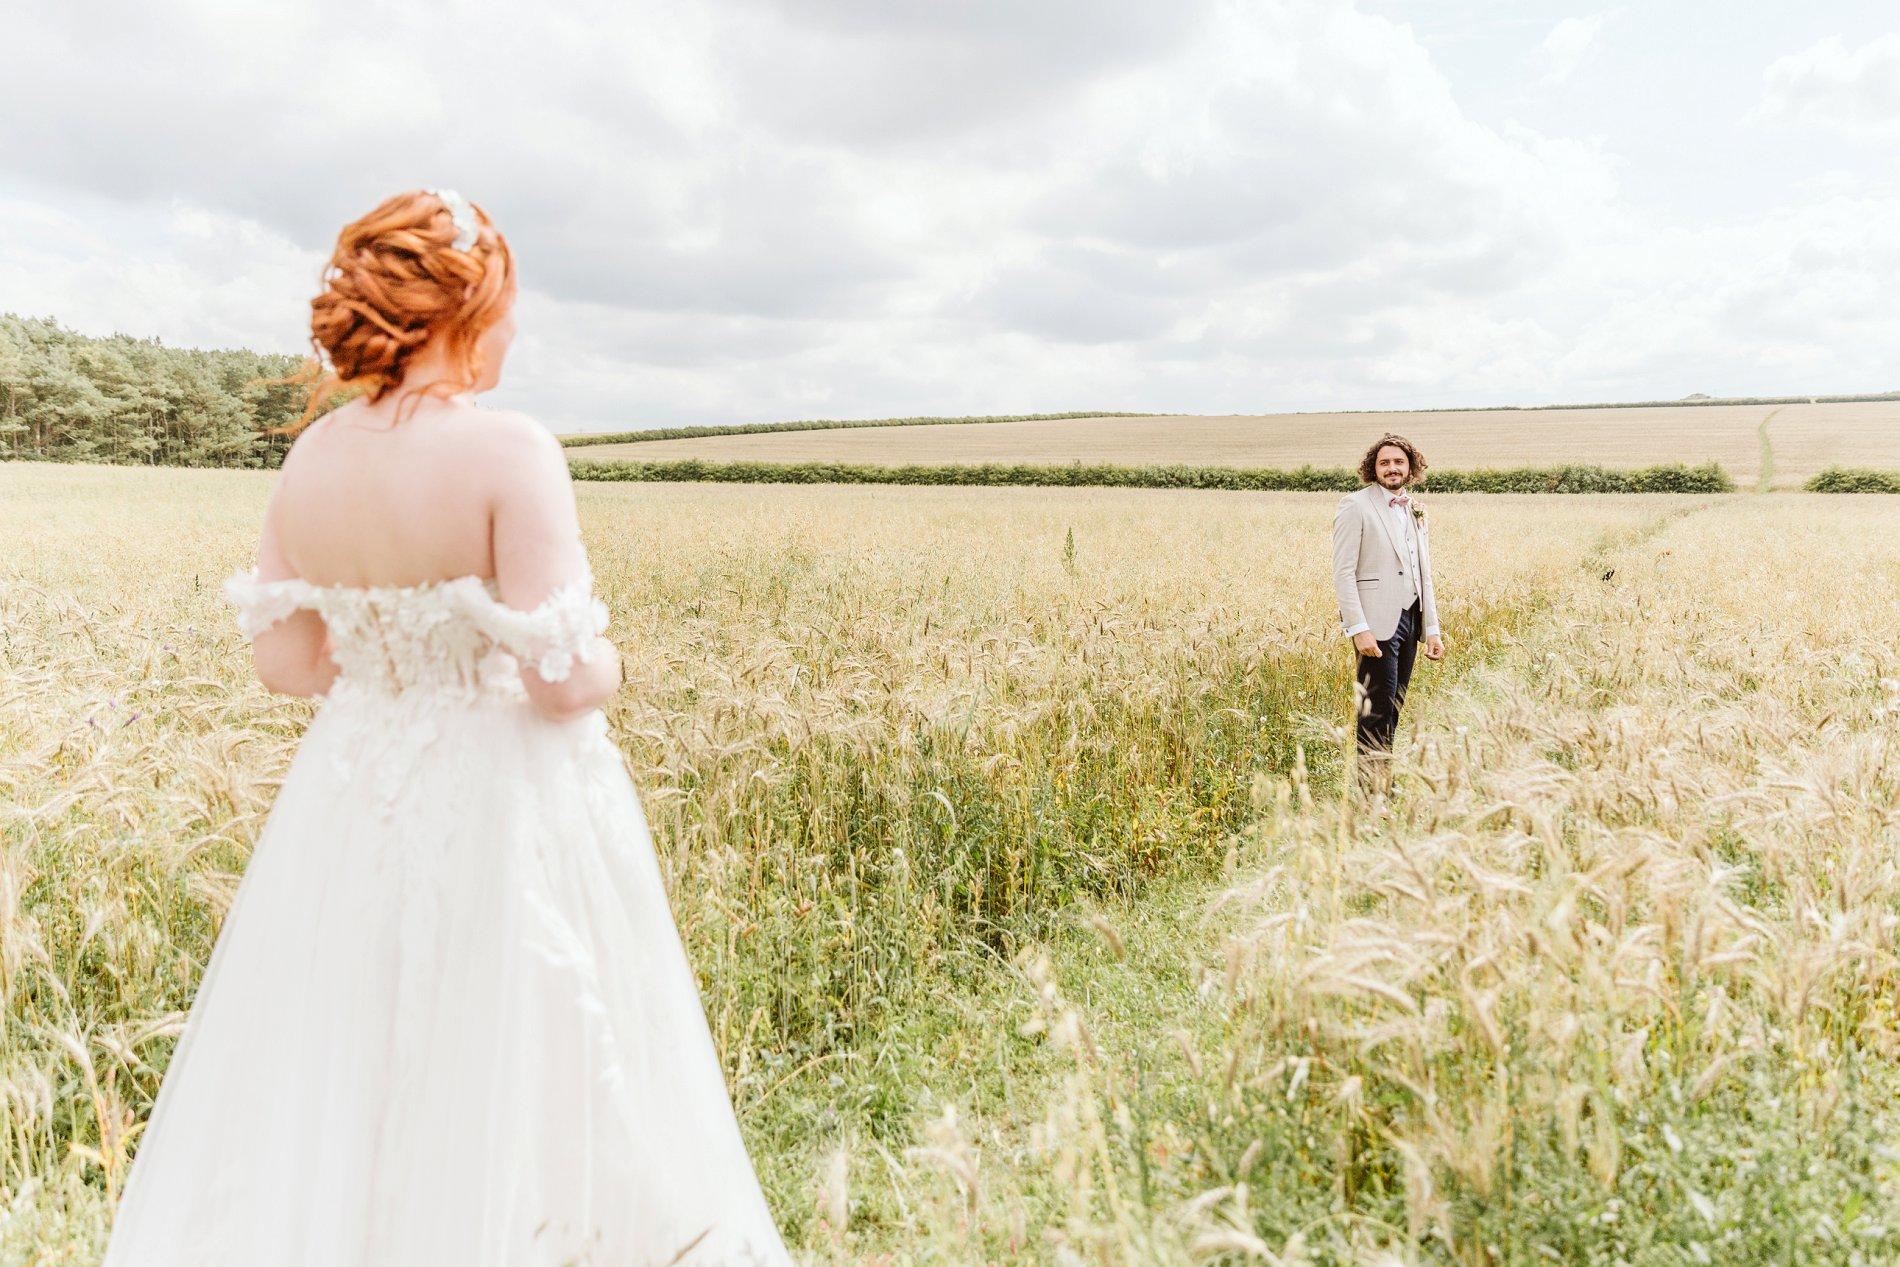 Saying I Do Rustic Wedding Creative Shoot (c) Charlotte Eve Photography (7)